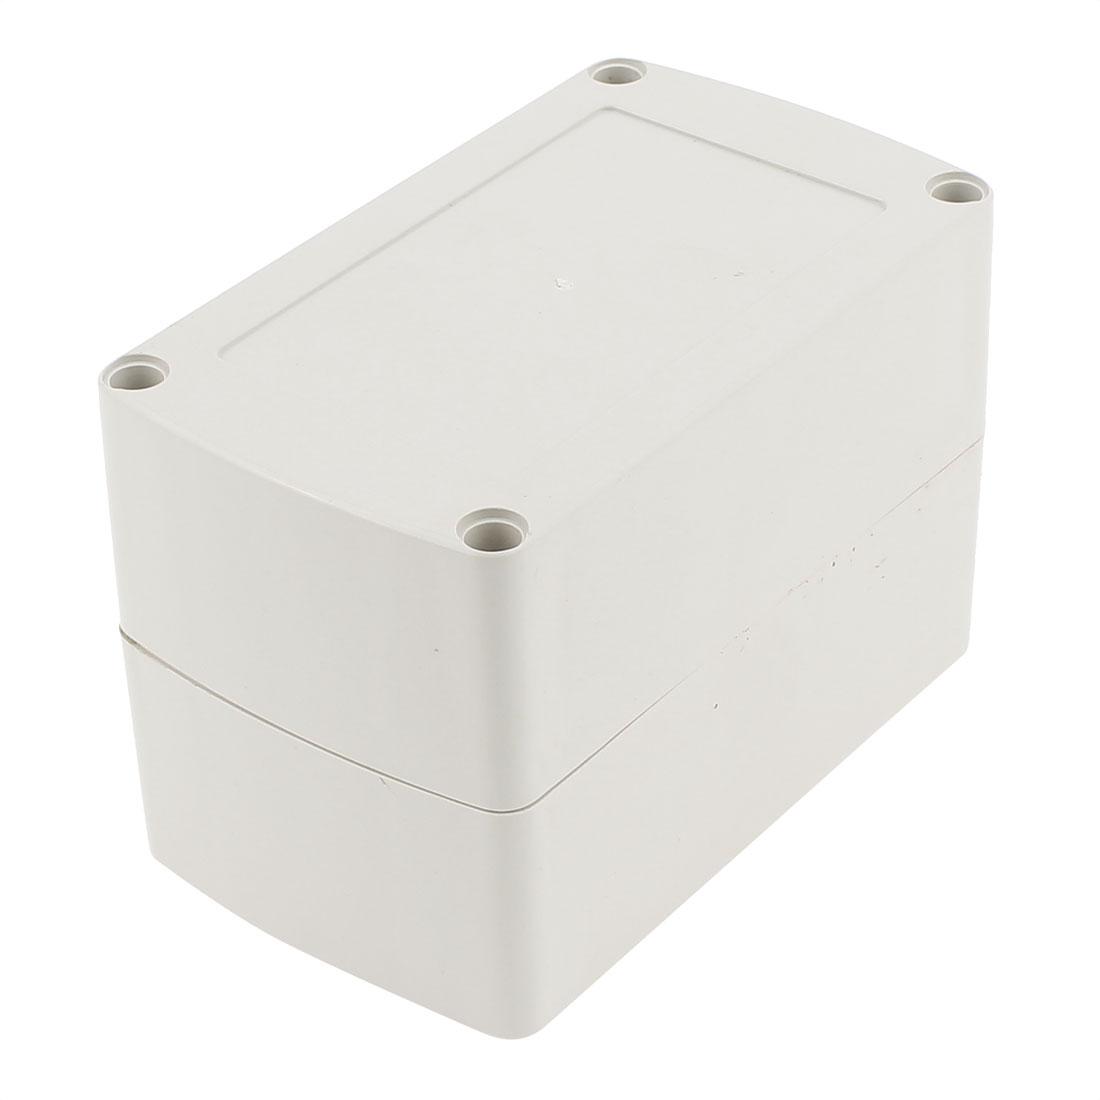 133 x 80 x 90mm Dustproof IP65 Junction Box Terminal Connection Box Enclosure